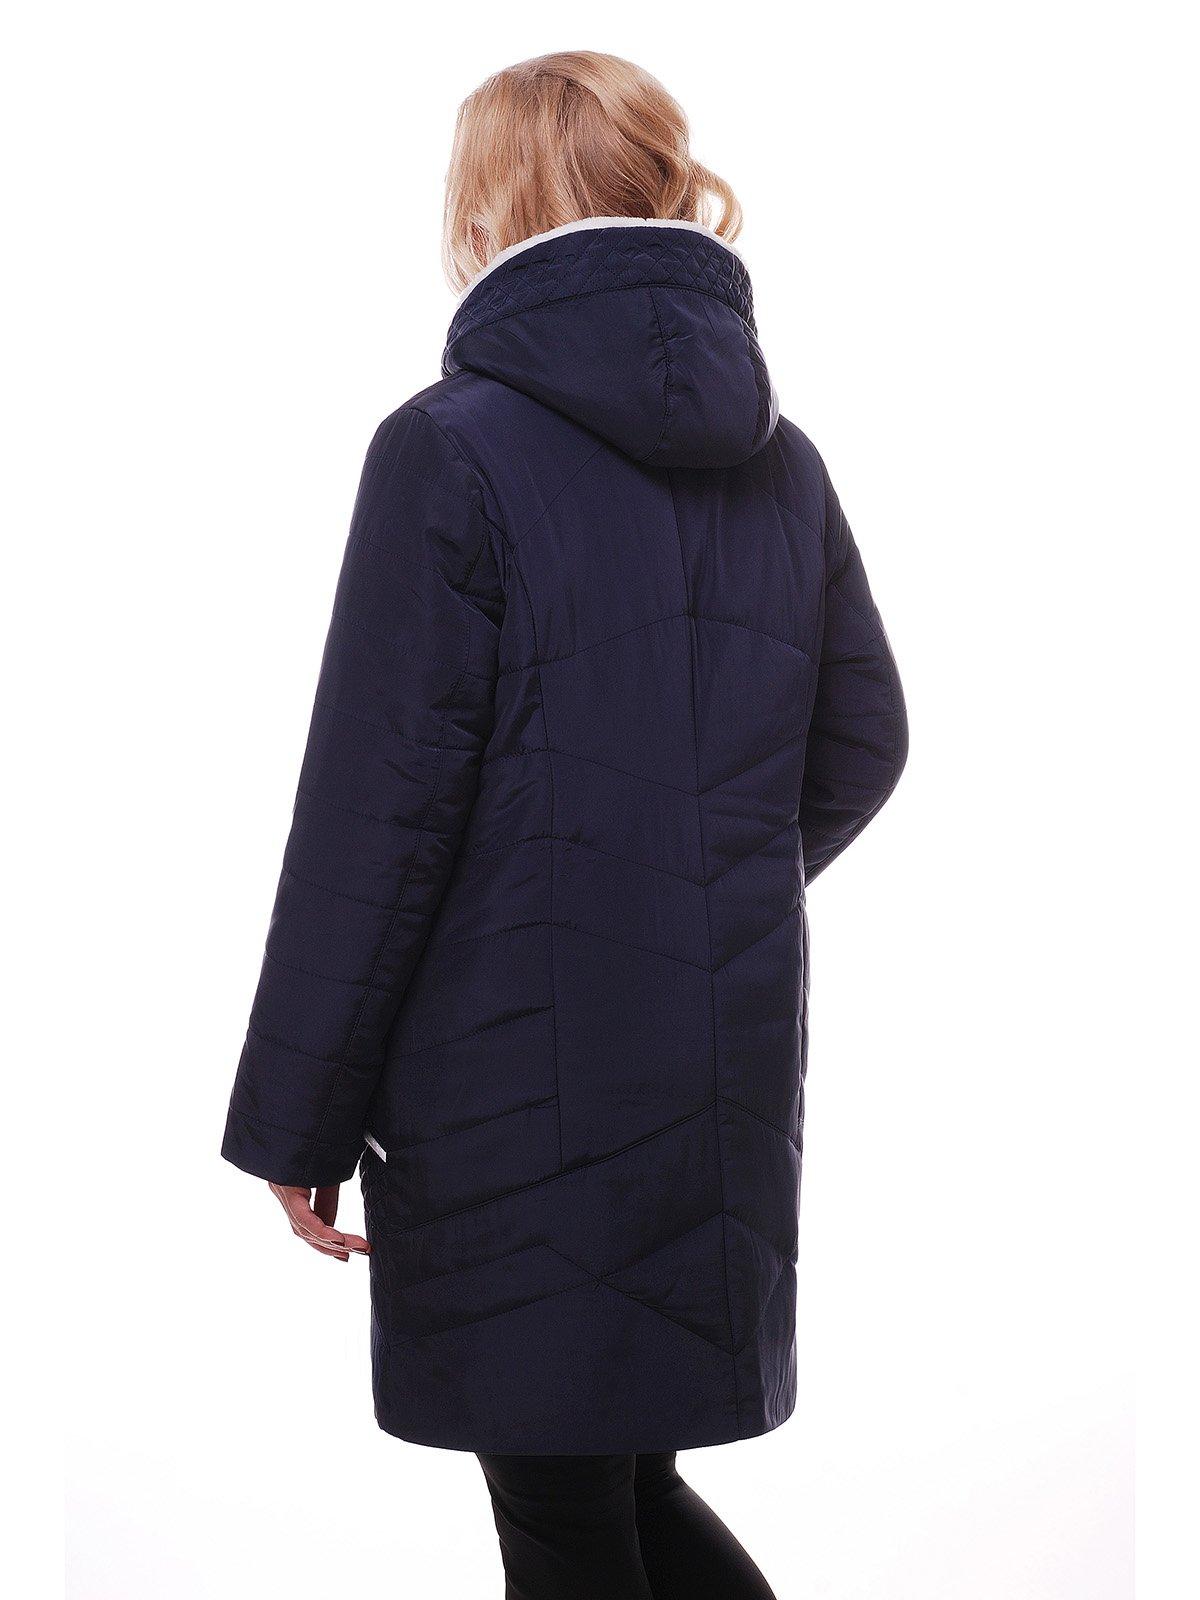 Куртка темно-синяя | 3814240 | фото 3